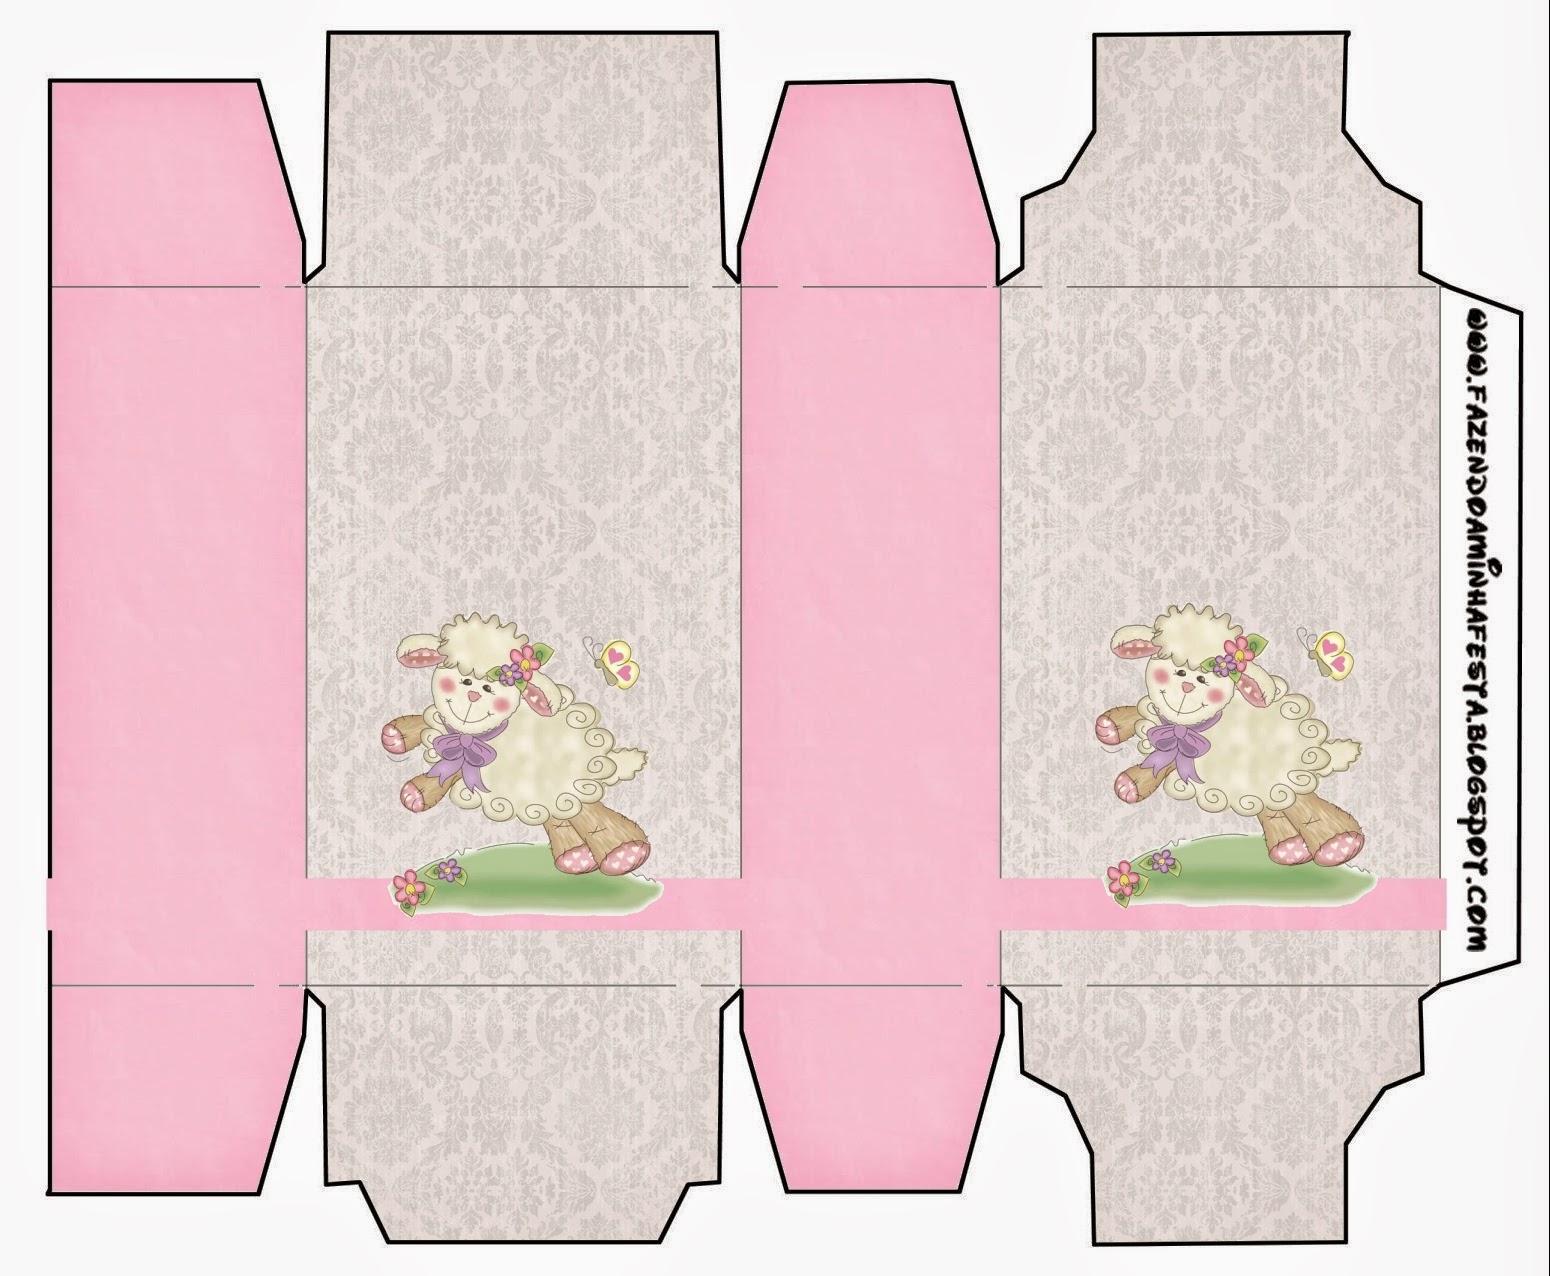 Cajas de Ovejita en Fondo Rosa para imprimir gratis.